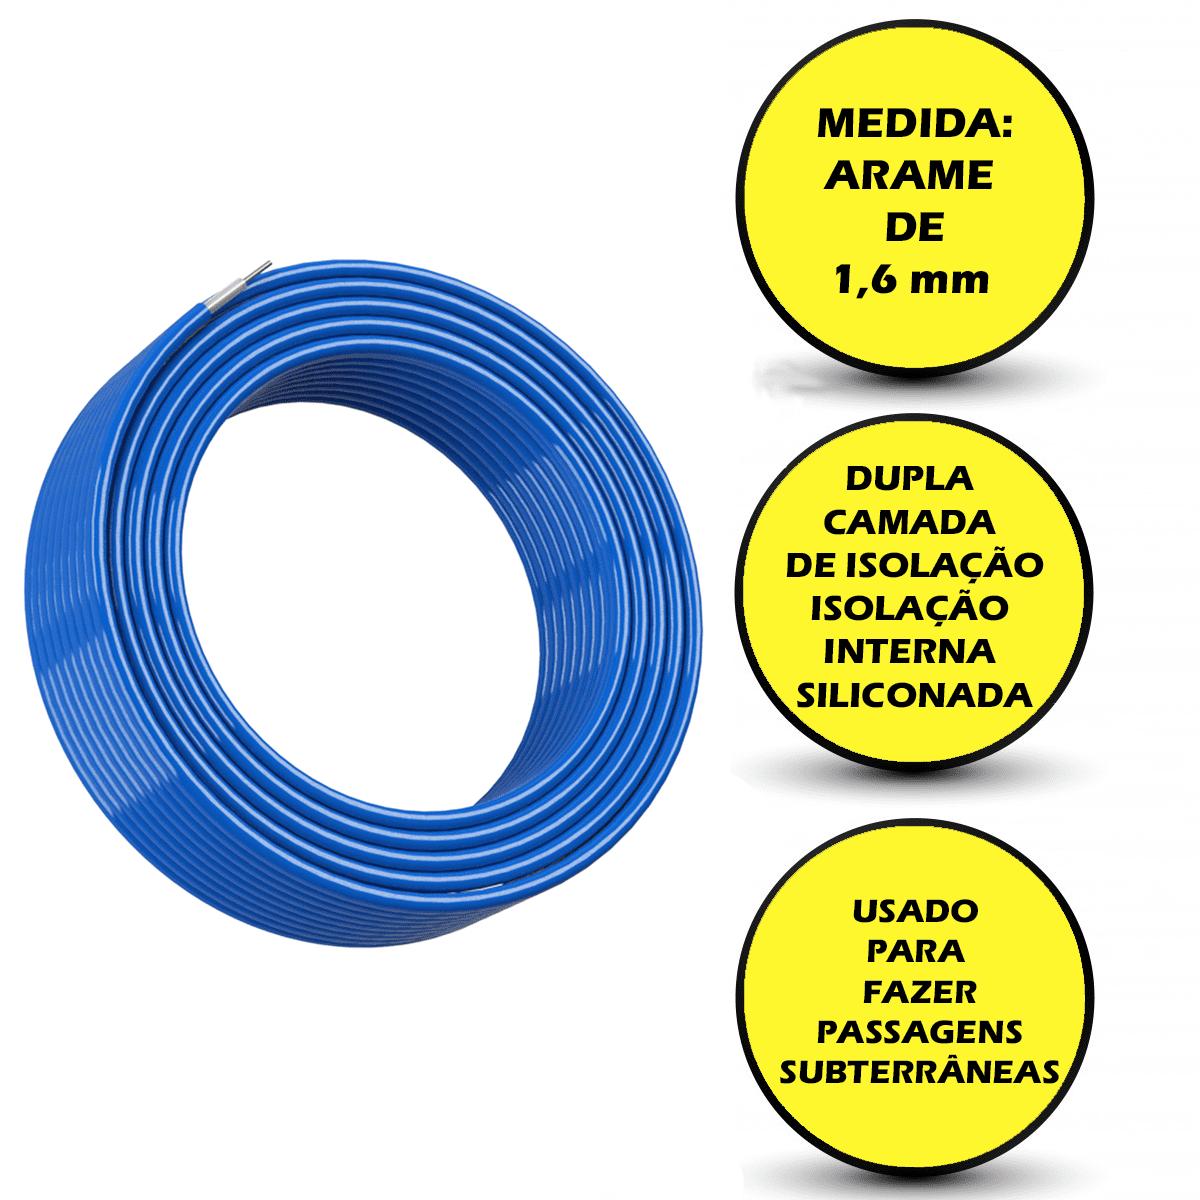 Cabo Subterraneo Para Cerca Eletrica Rural Super Reforçado 100 Metros  - Ambientude Agro e Pet